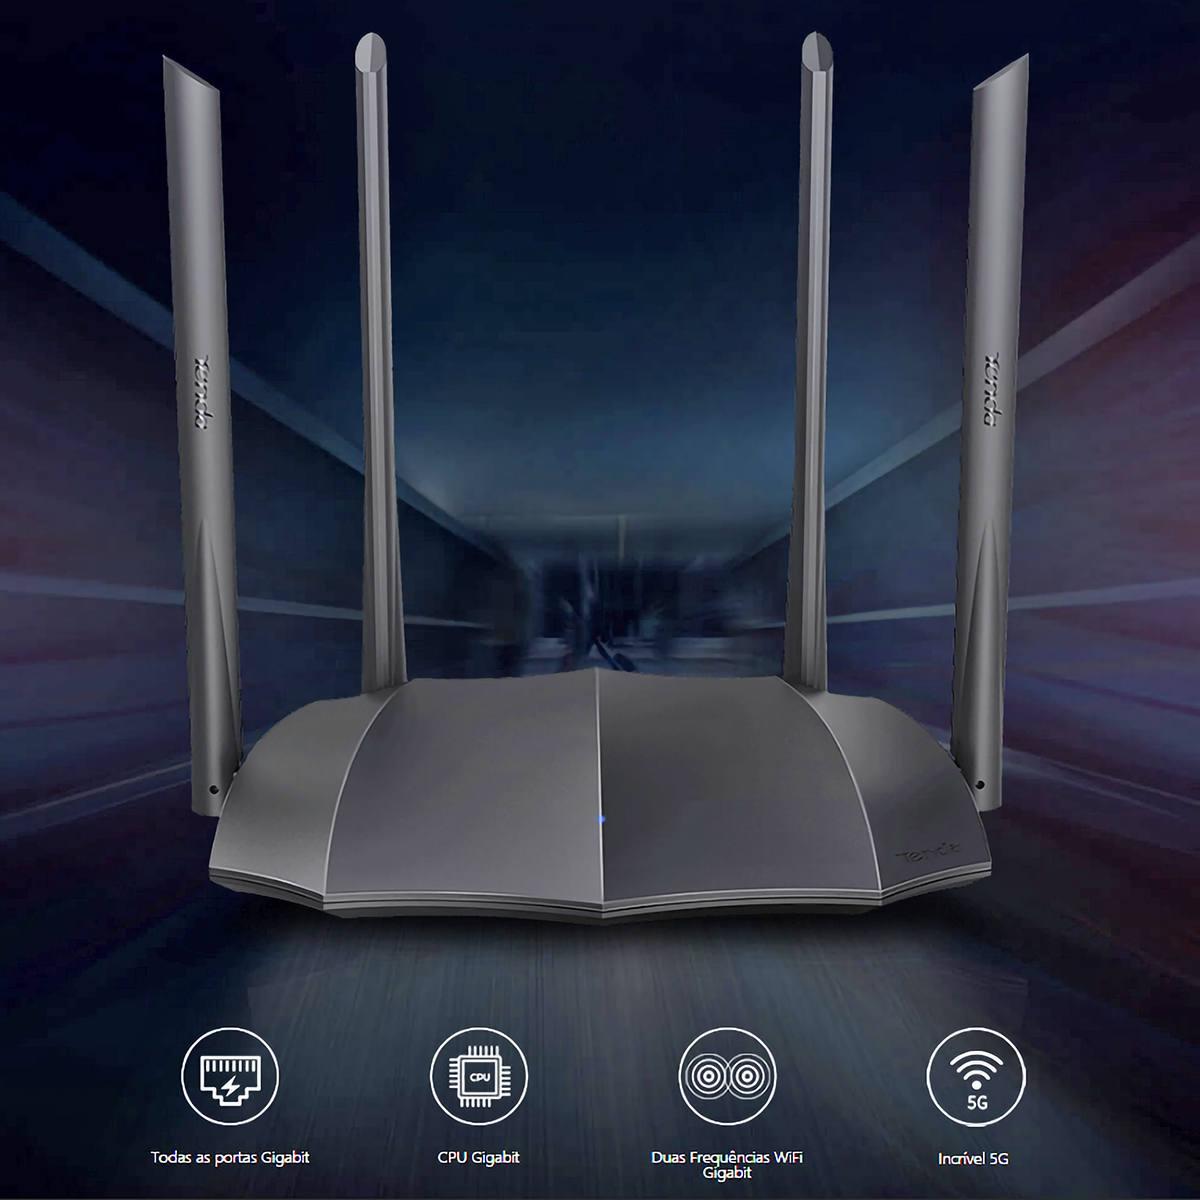 Roteador Sem Fio 1200Mbps Gigabit Wireless Dual-band AC1200 802.11AC 4 Portas Gigabit Tenda WiFI AC8